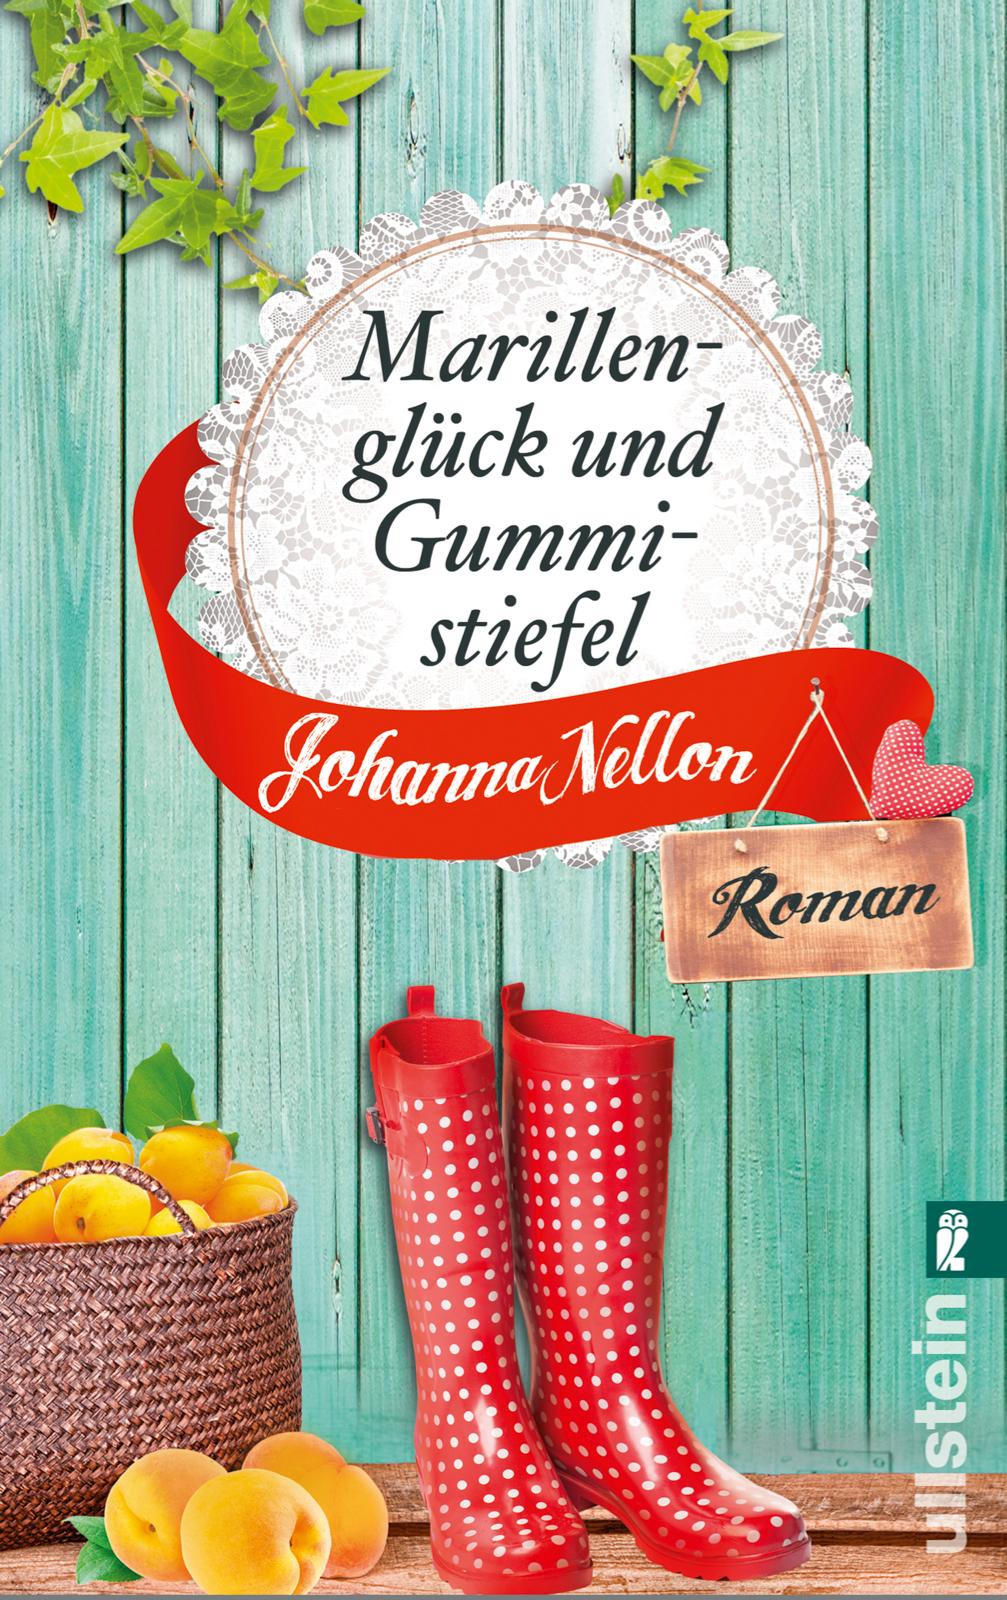 Marillenglück und Gummistiefel - Johanna Nellon